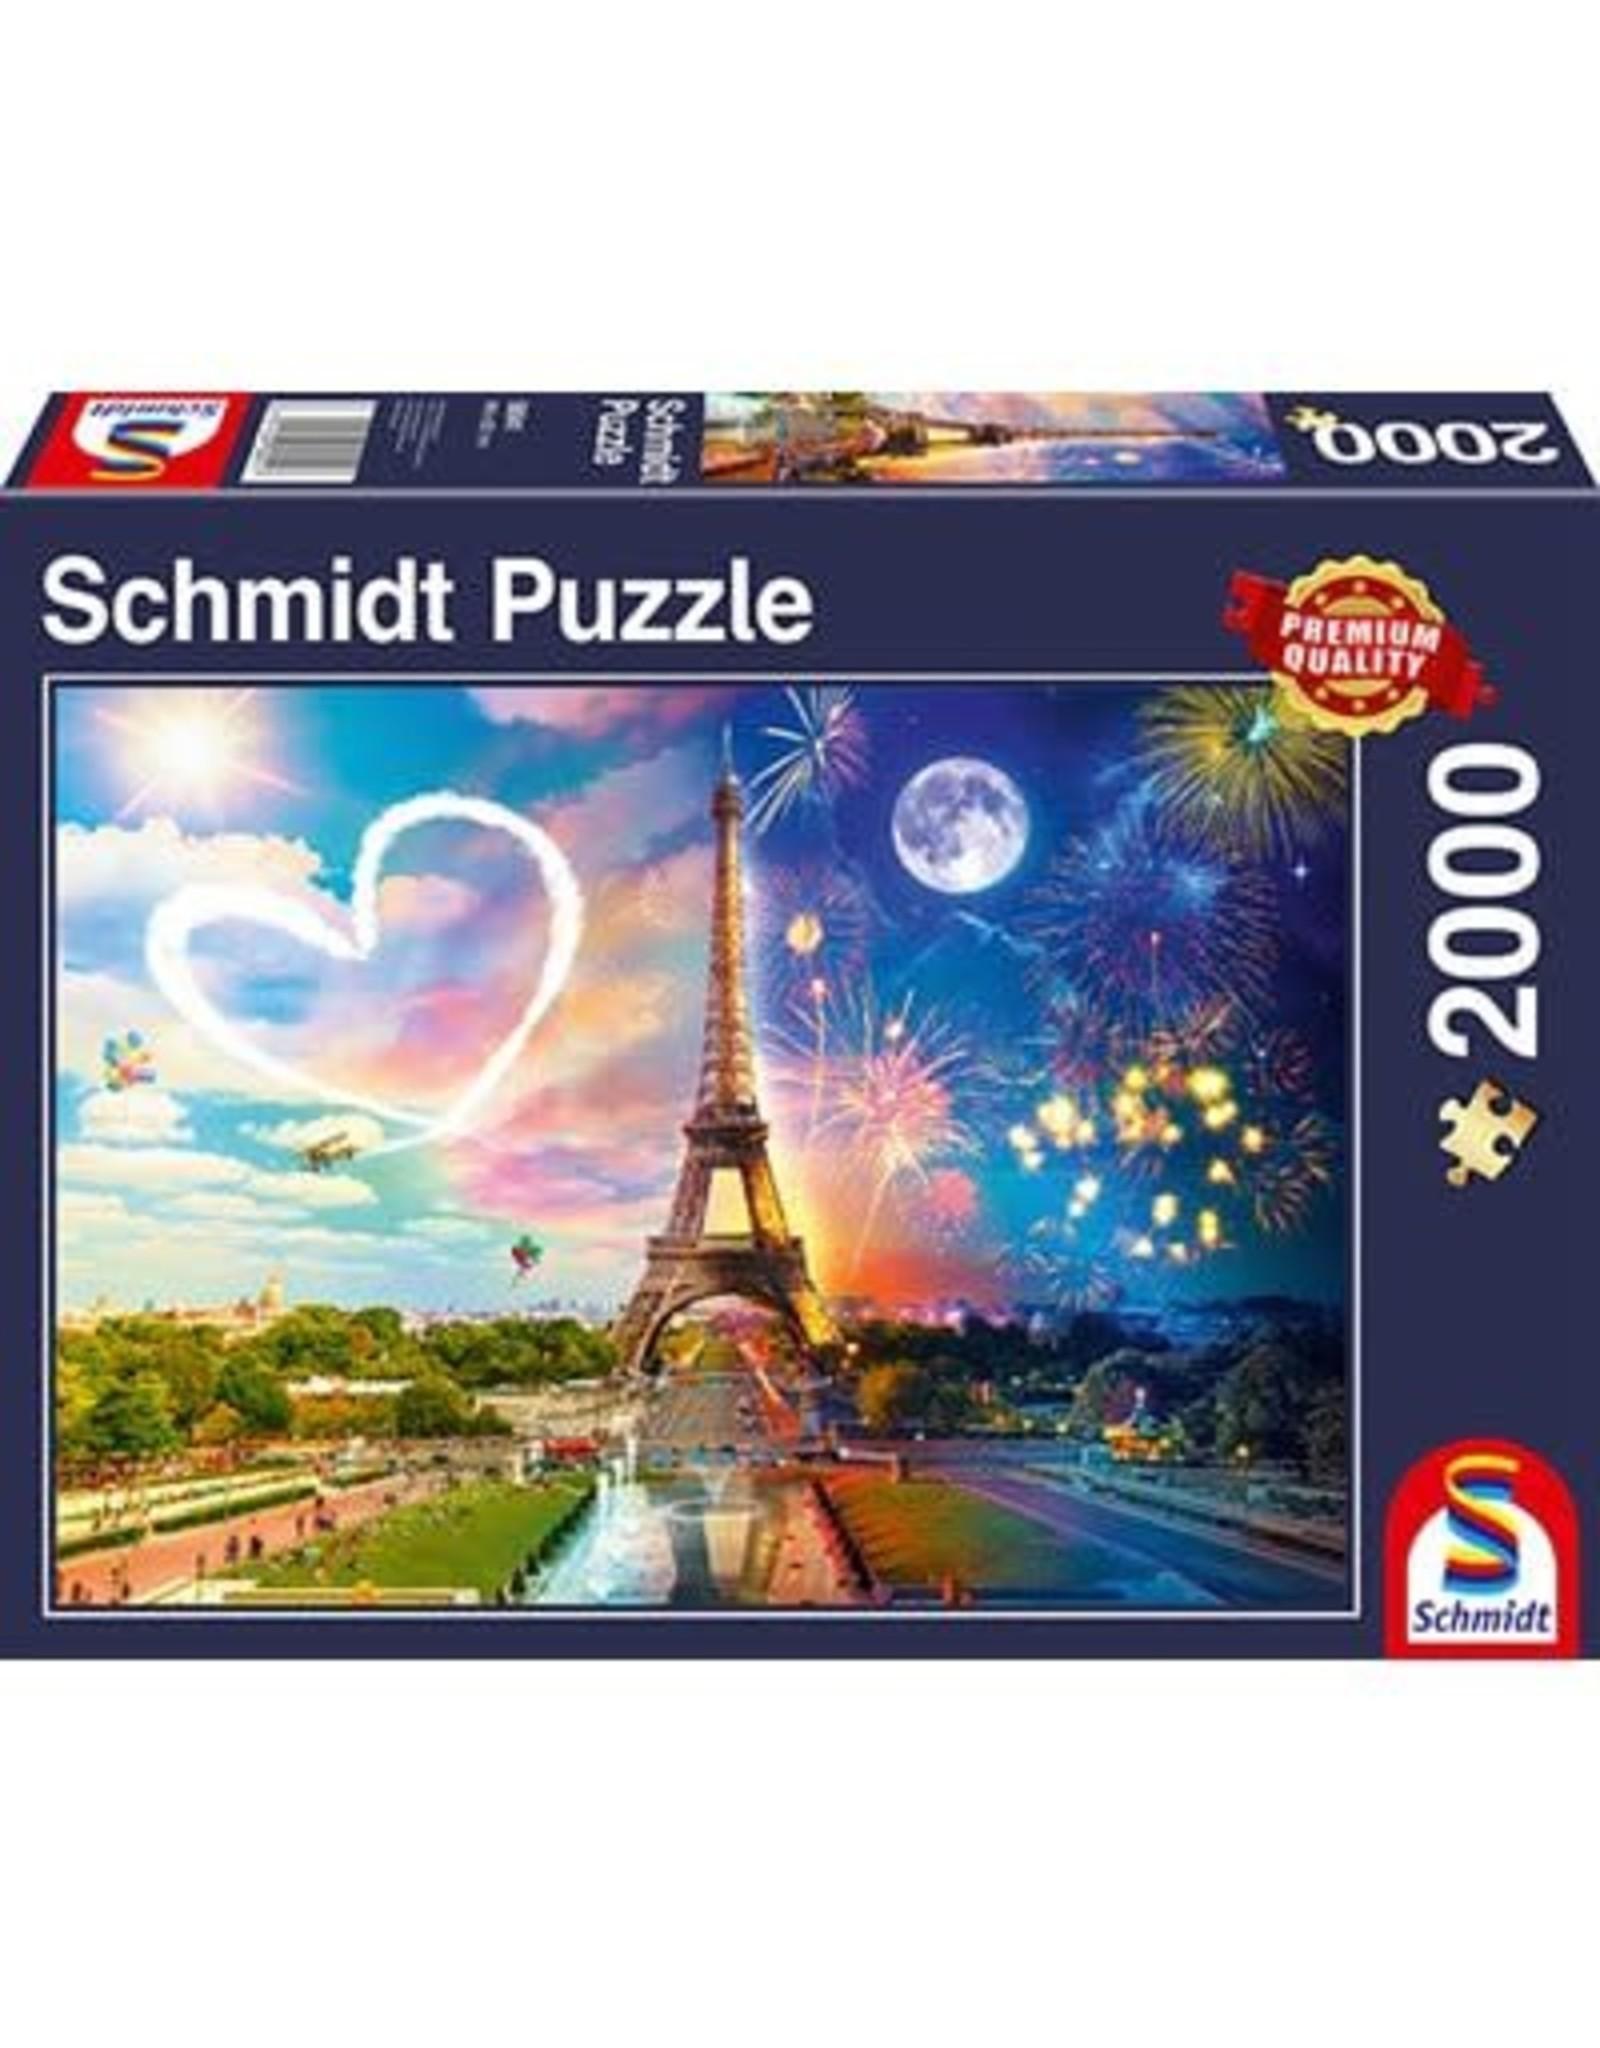 Schmidt Schmidt Puzzle: Paris, Day and Night 2000 Pieces